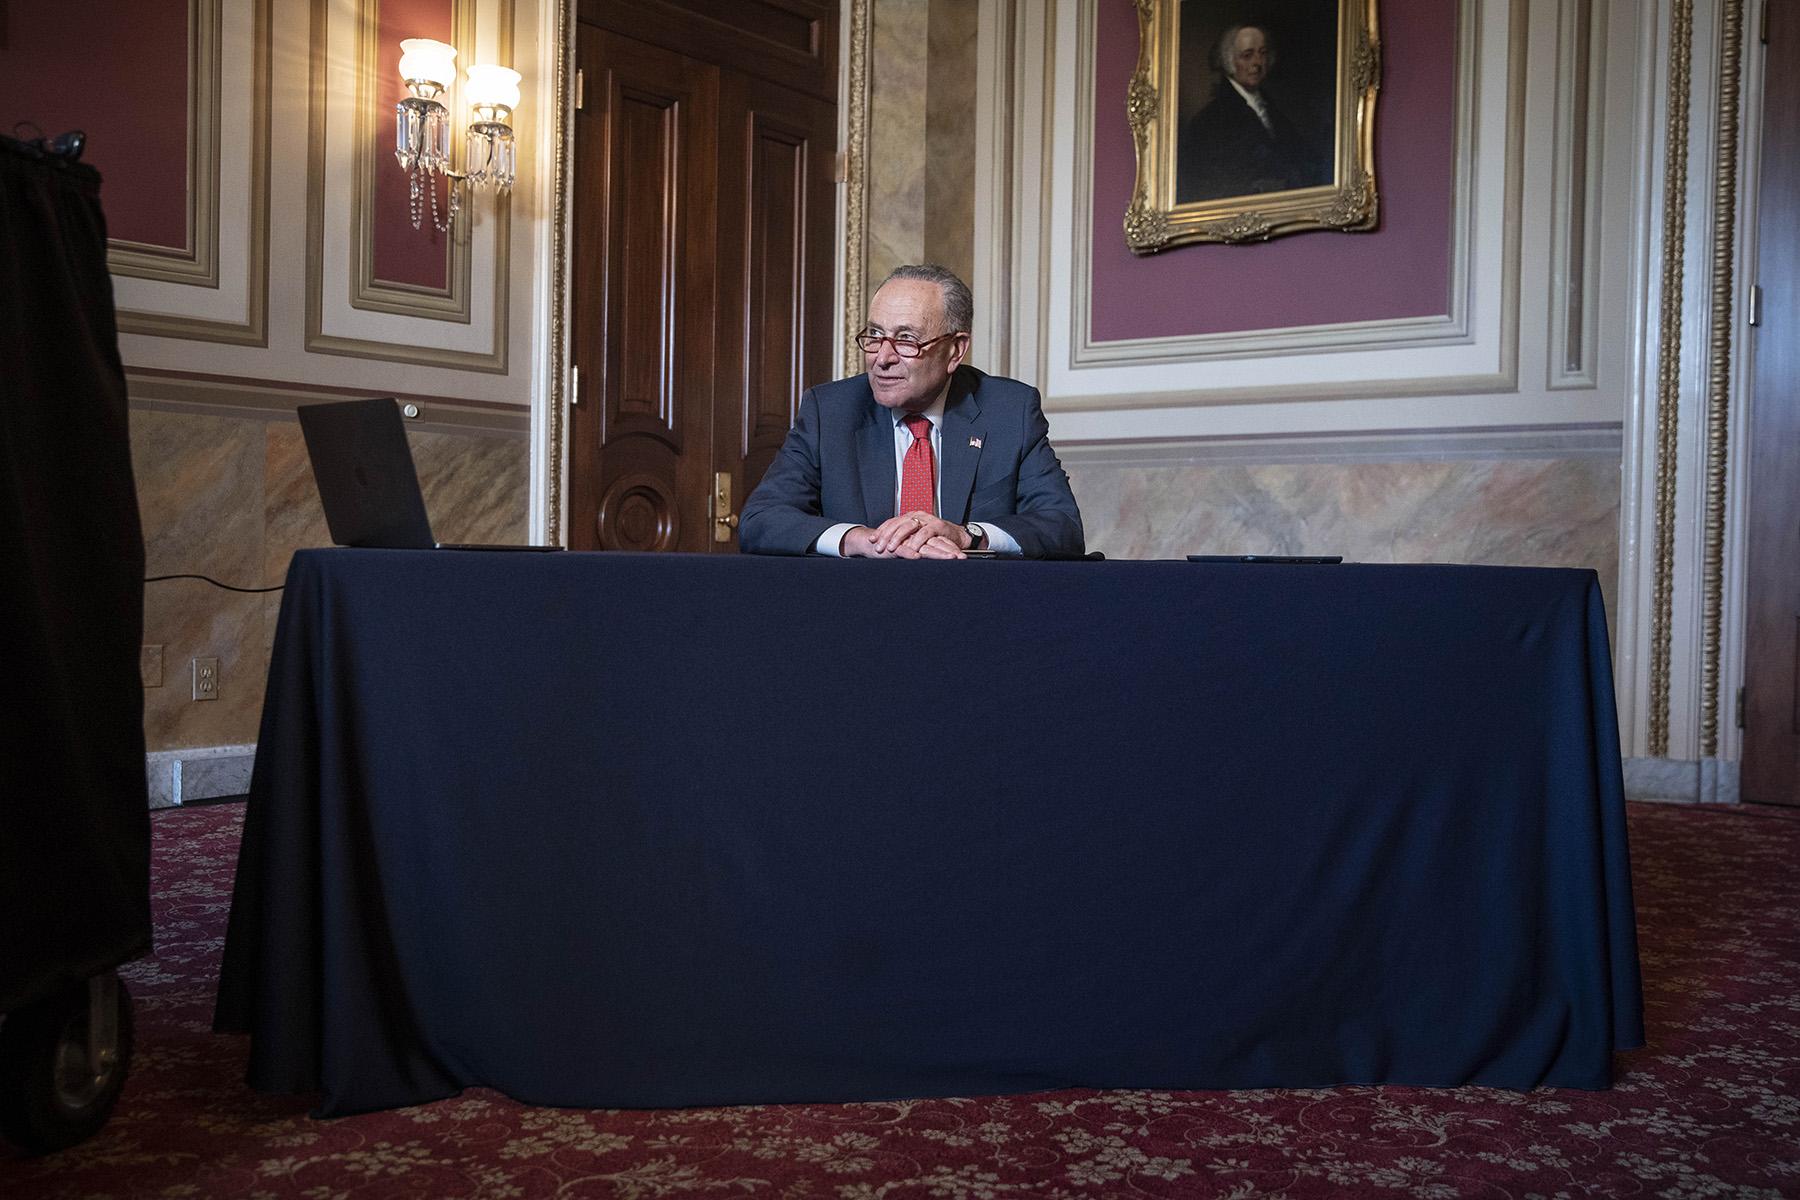 Senate Minority Leader Chuck Schumer, meets virtually with General Lloyd Austin, U.S. secretary of defense-designate, at the U.S. Capitol in Washington, DC, on Tuesday, Dec. 15.